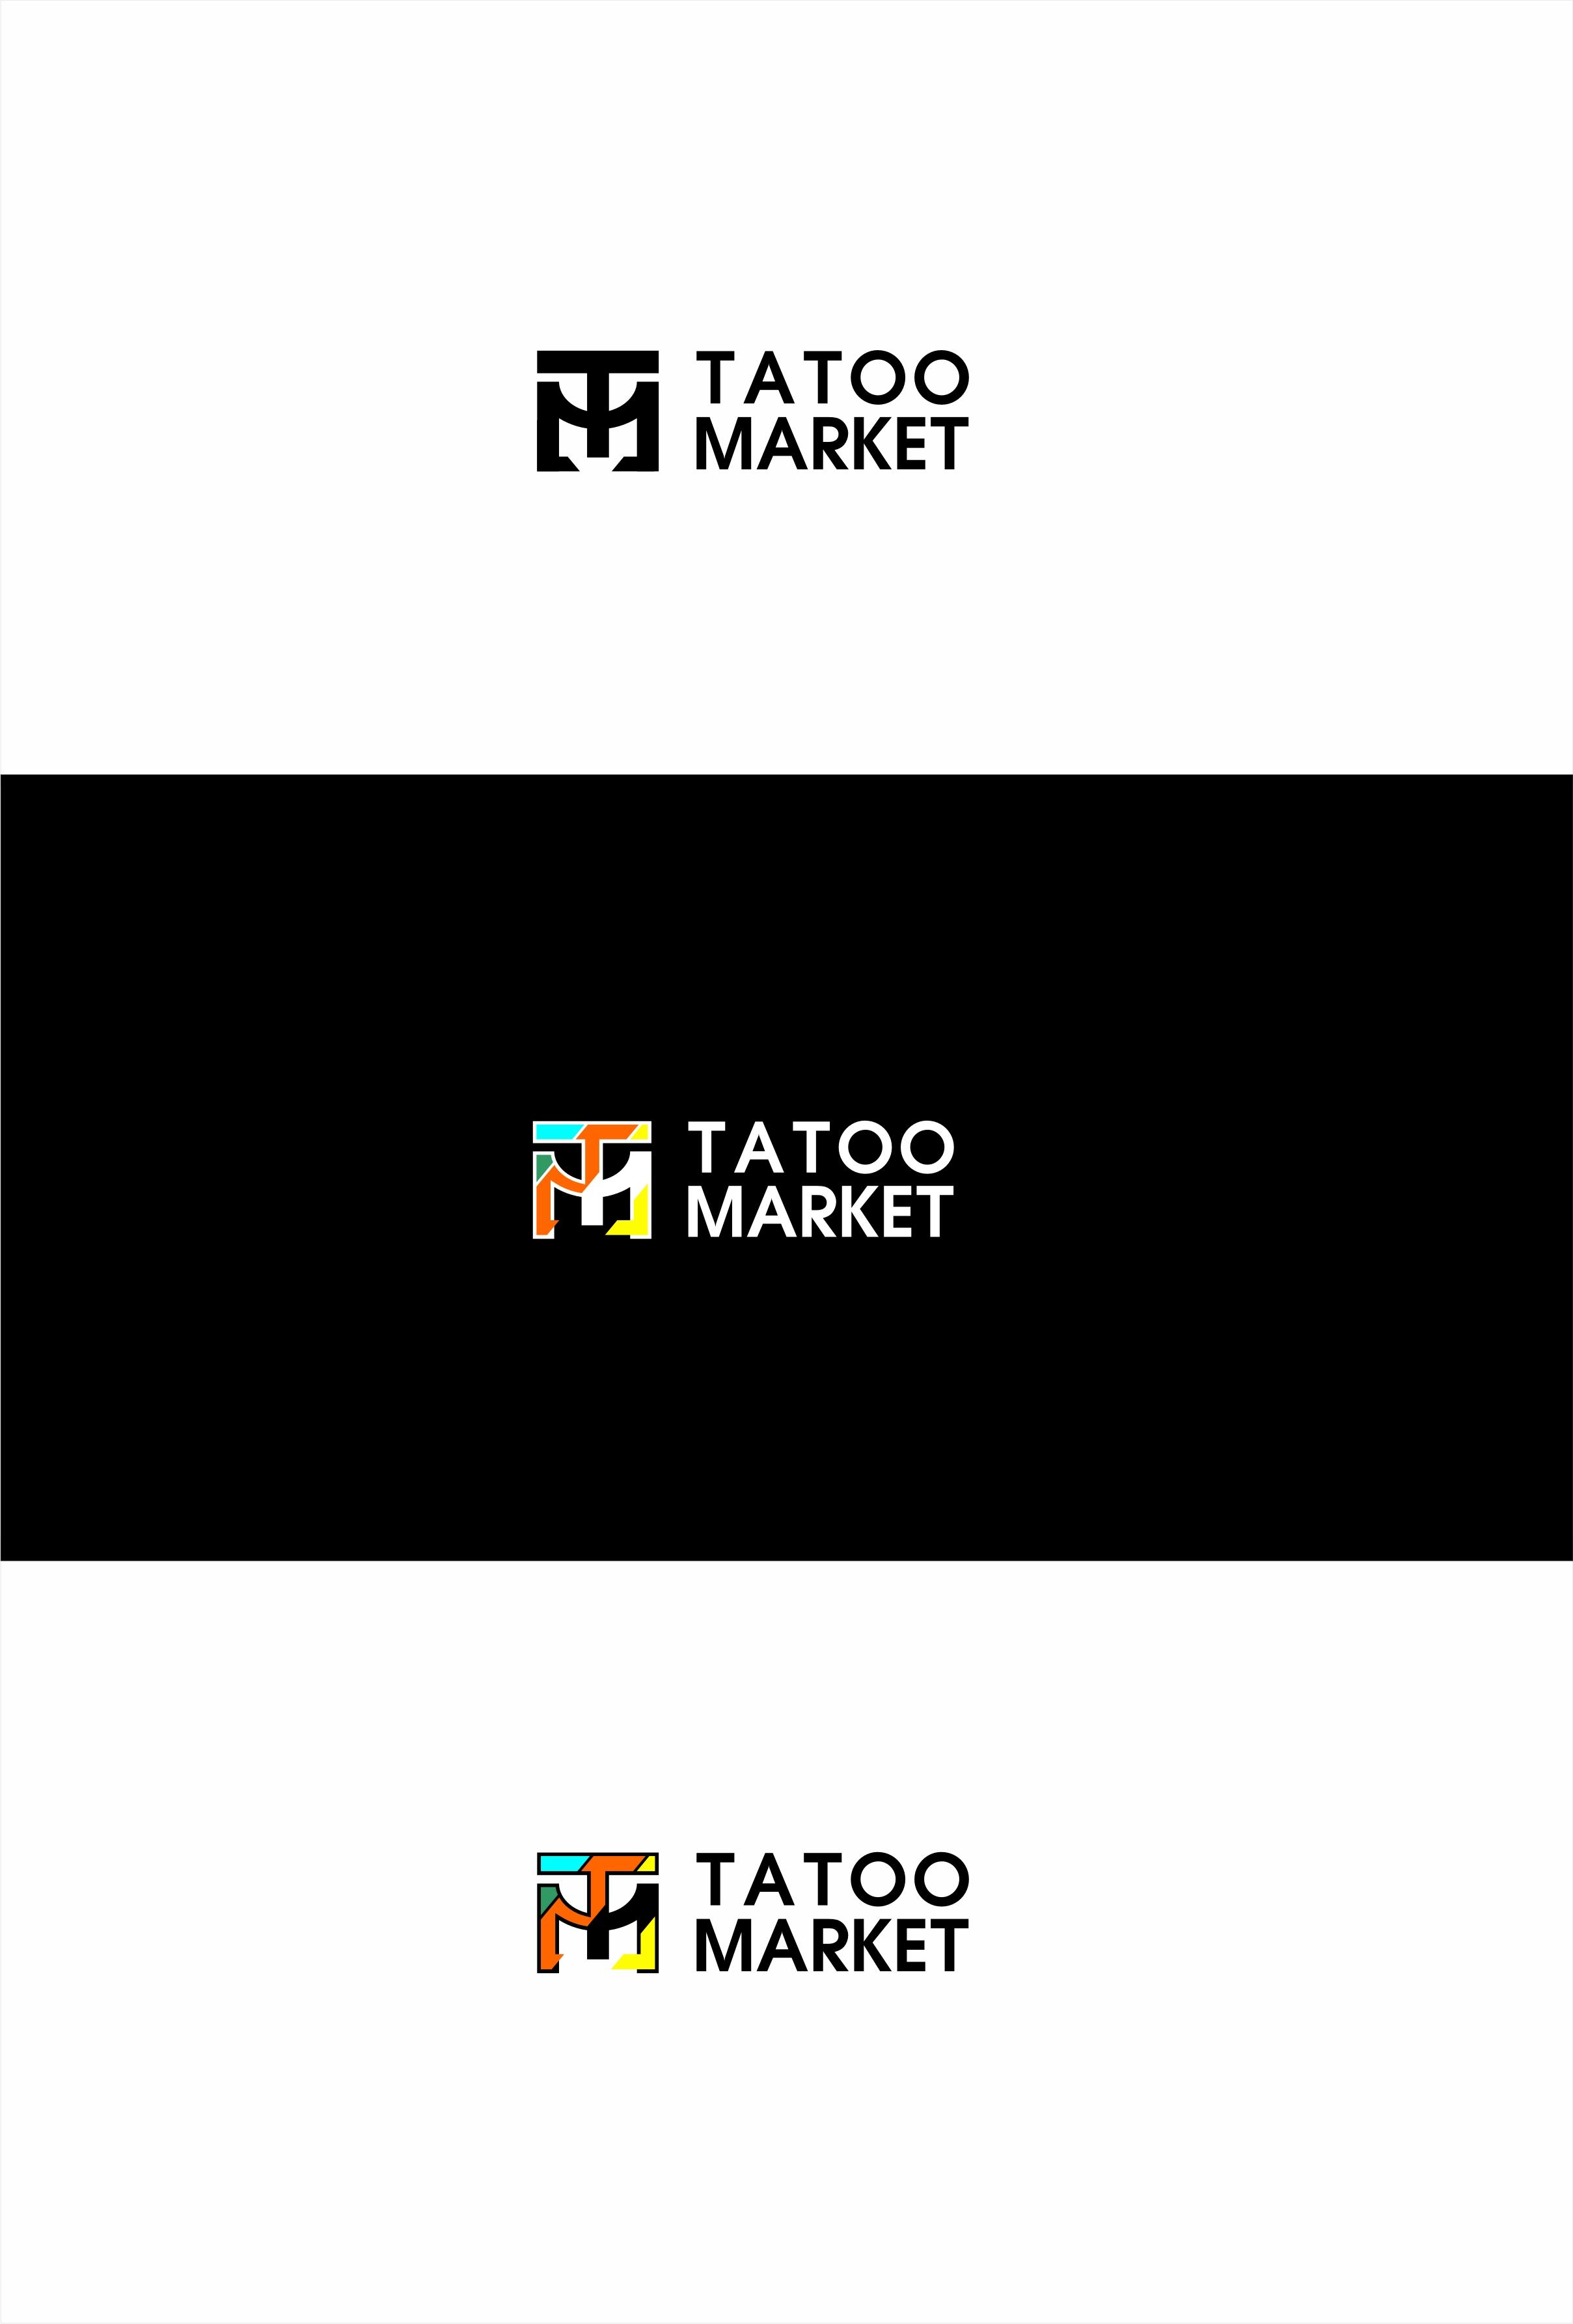 Редизайн логотипа магазина тату оборудования TattooMarket.ru фото f_3955c39da498c0fa.jpg